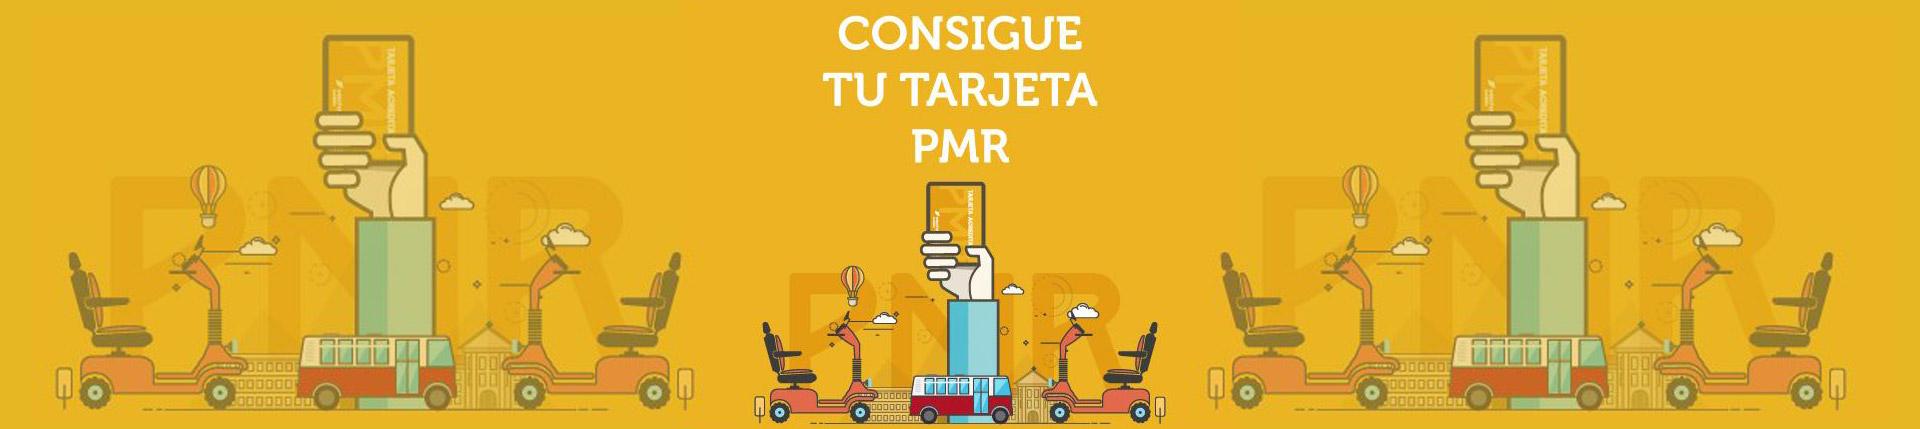 Consigue tu tarjeta PMR